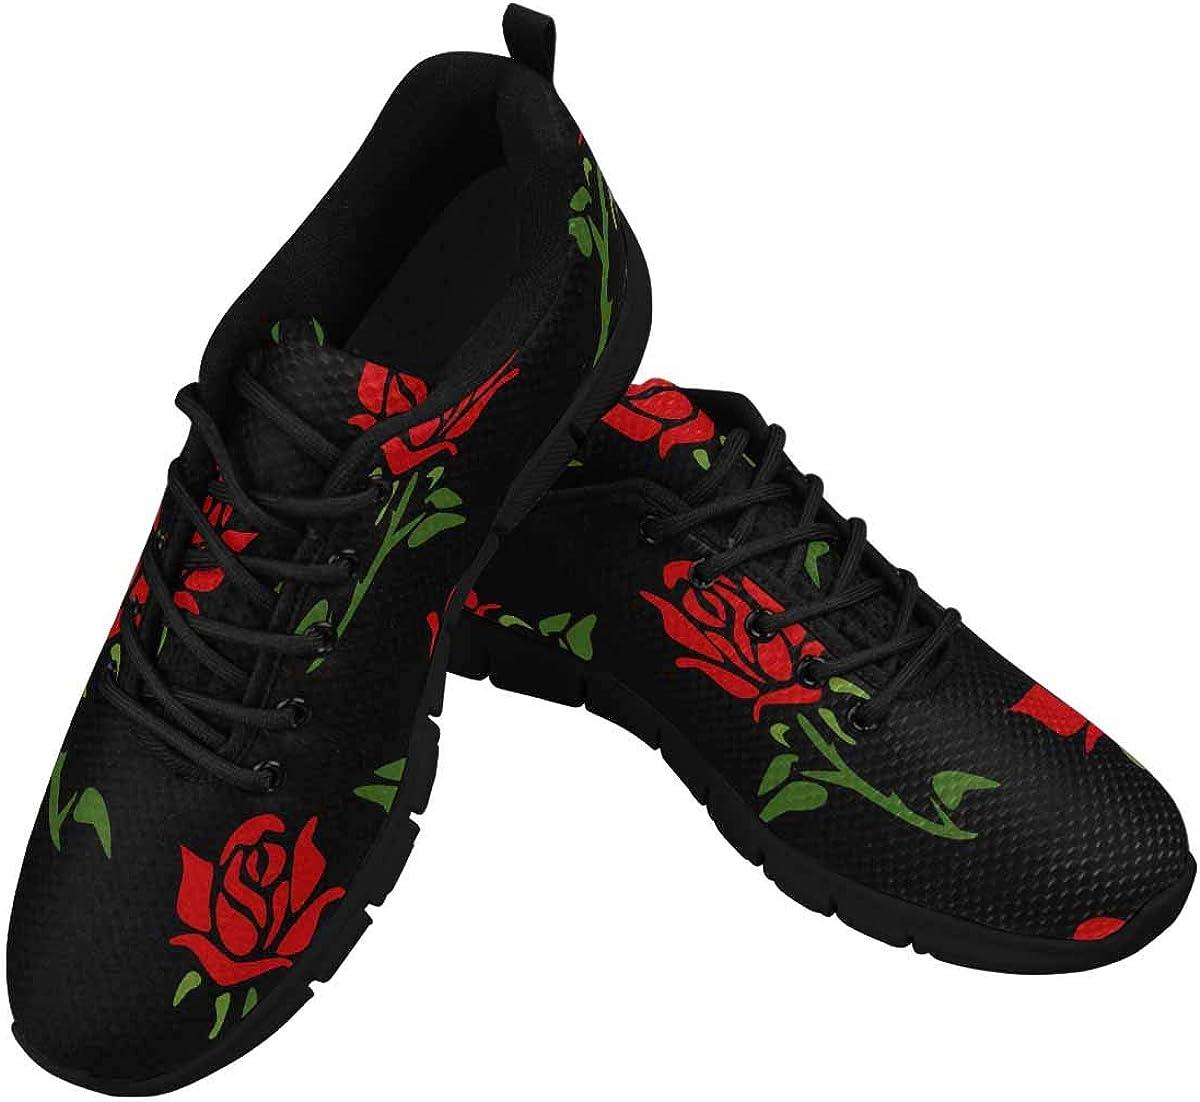 INTERESTPRINT Red Roses Pattern Women's Tennis Running Shoes Lightweight Sneakers